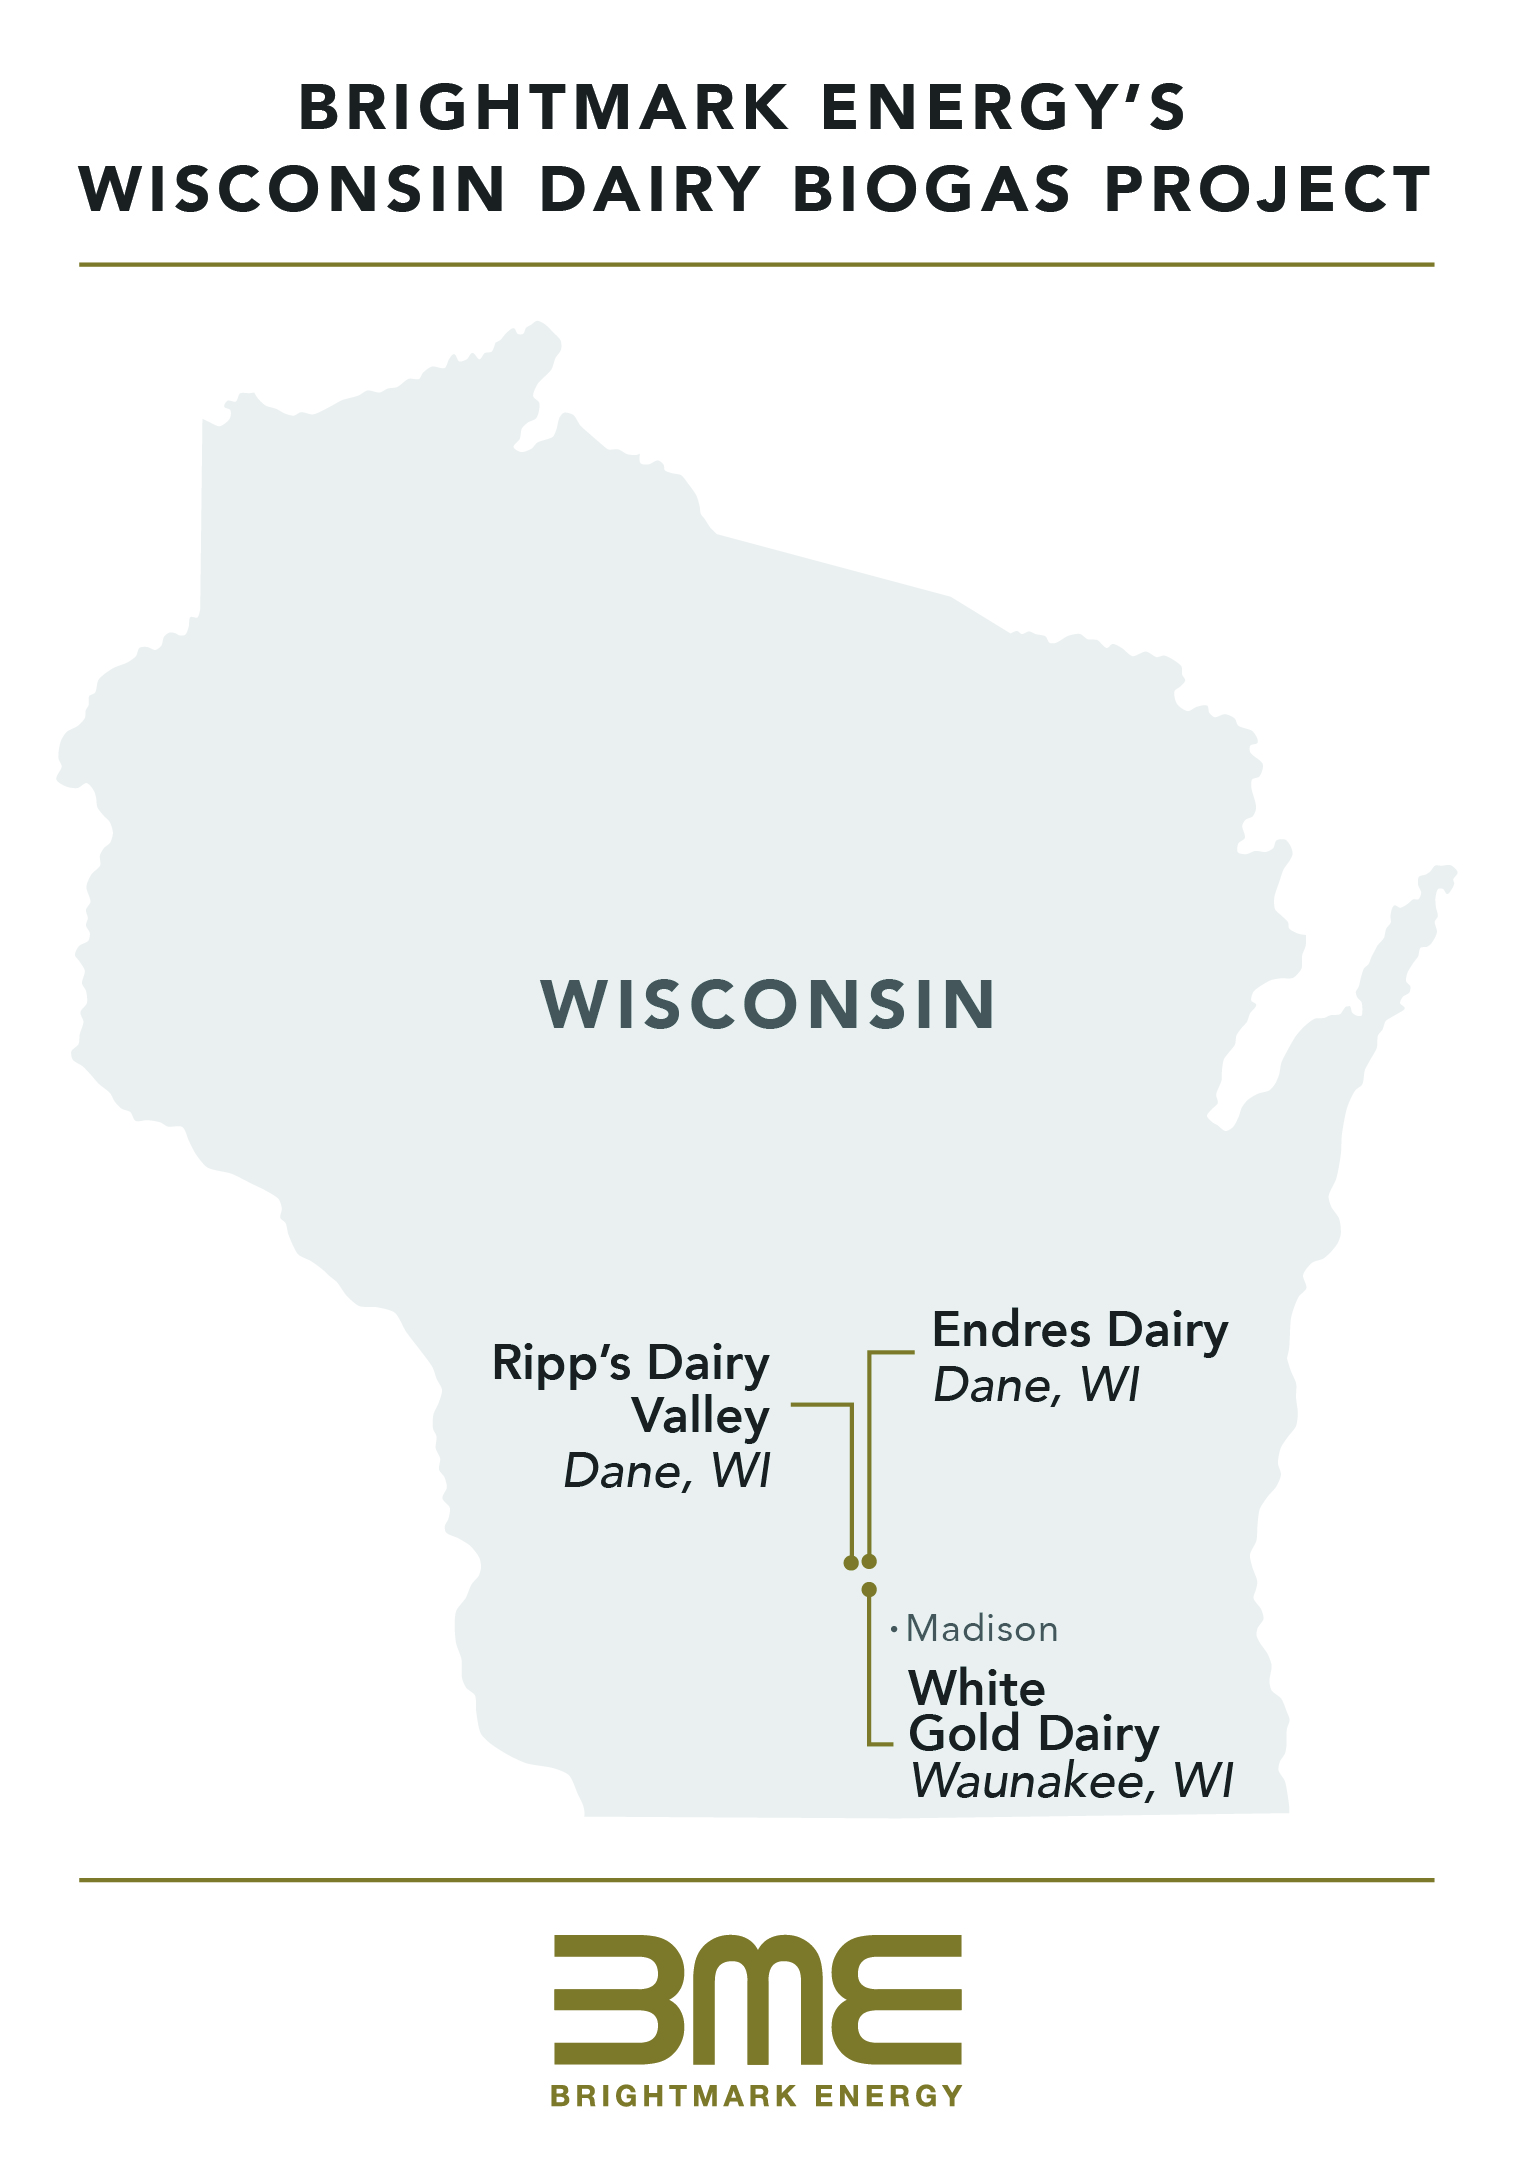 Brightmark-WisconsinBiogas